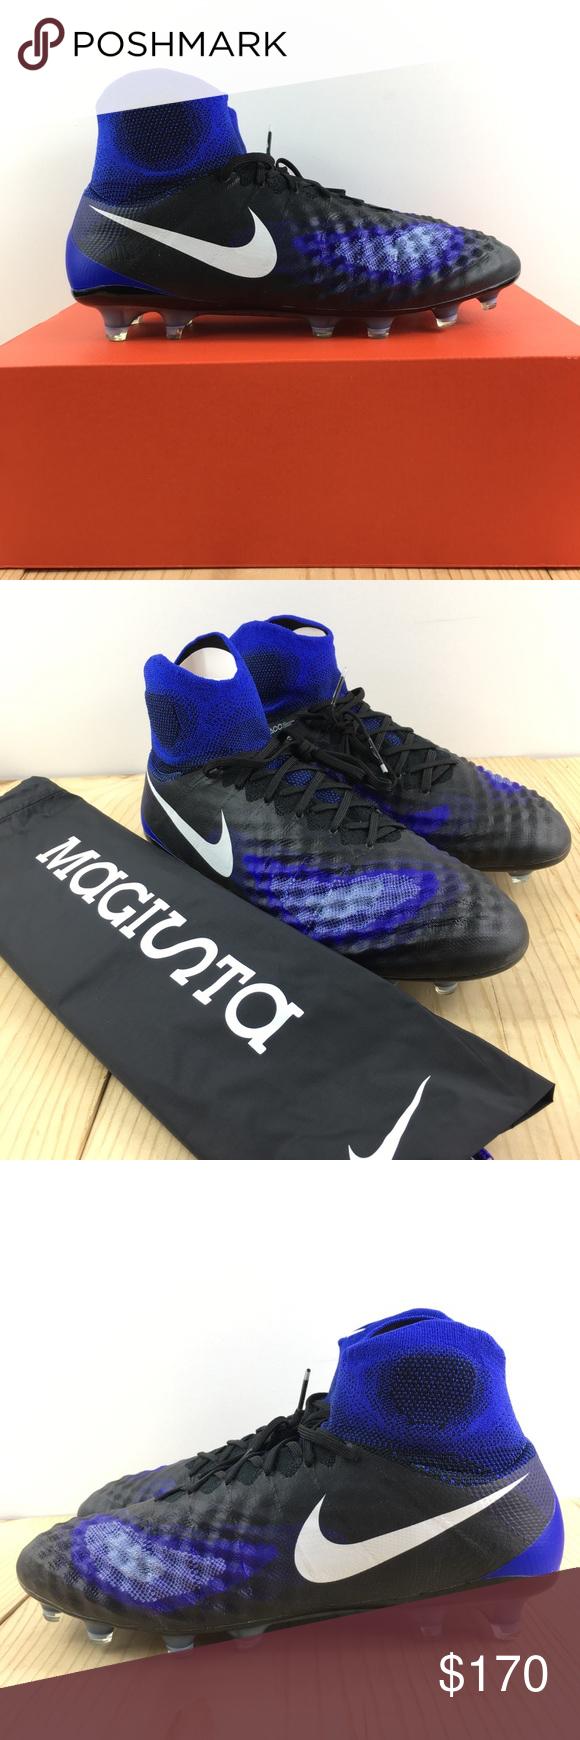 Nike Magista voetbaltrainers Nike voetbalsporten